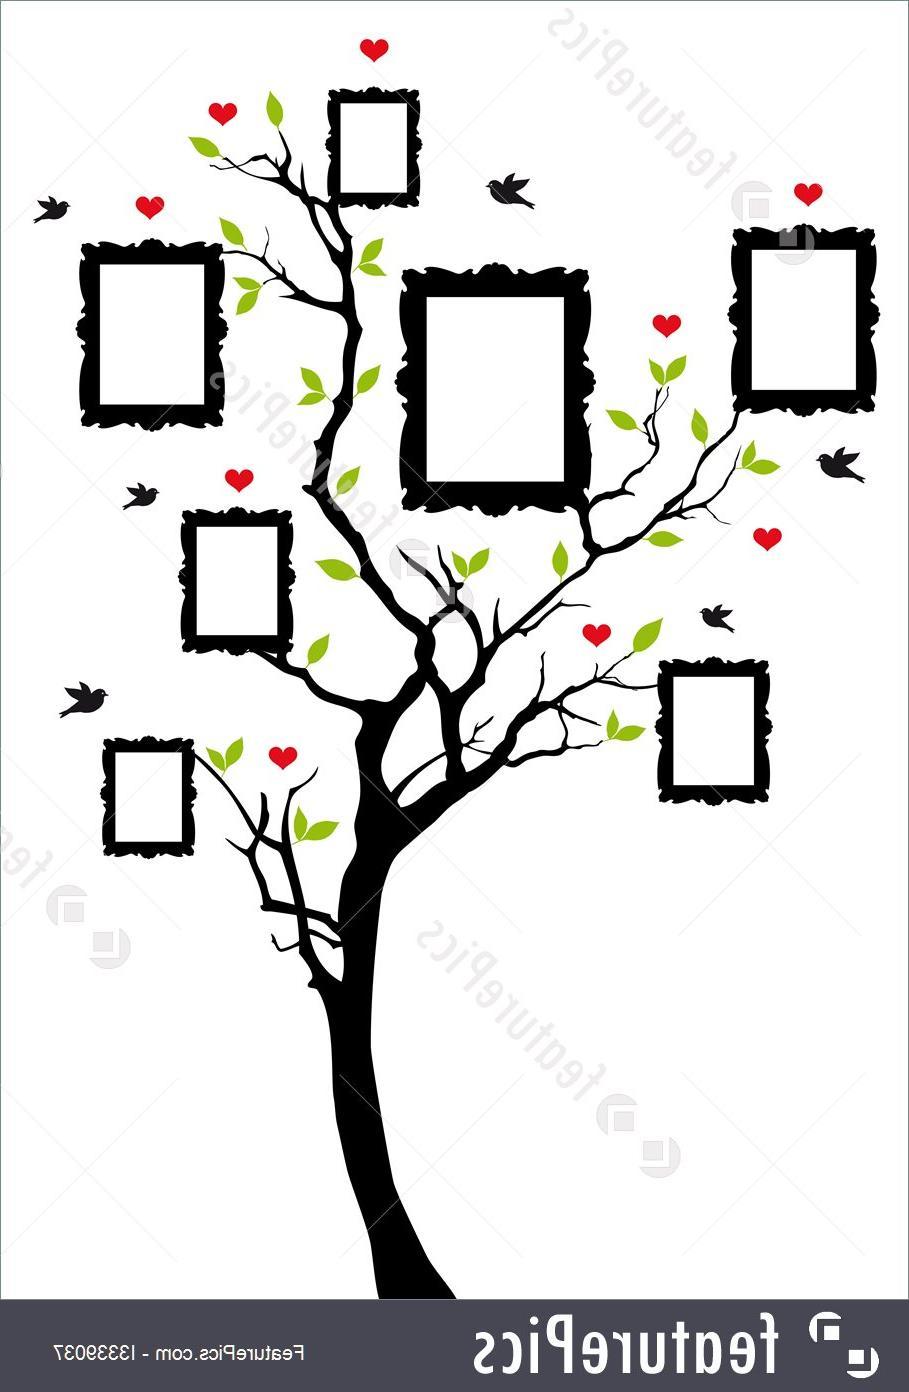 Family Tree Diagram Best Blank Family Tree Diagram Vector Photos Free Vector Art